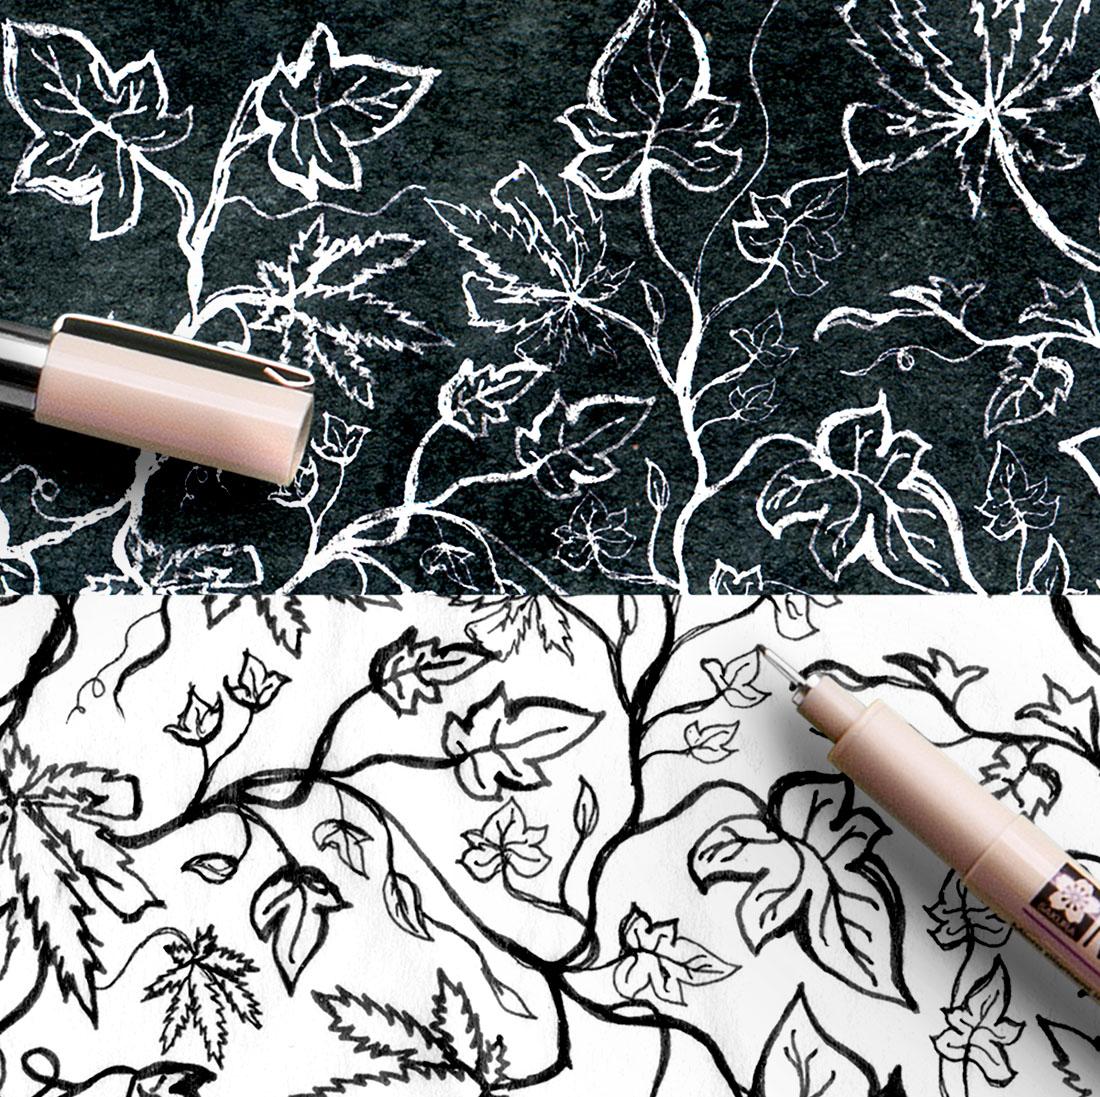 EyeSavvy Design Studio | Black Ivy Branding, Brand Identity, Brand Design, EP Branding, Graphic Design,  Hand-Drawn Pattern, Logo Design #branding #albumcover #brandidentity #branddesign #marketing #artisticbranding